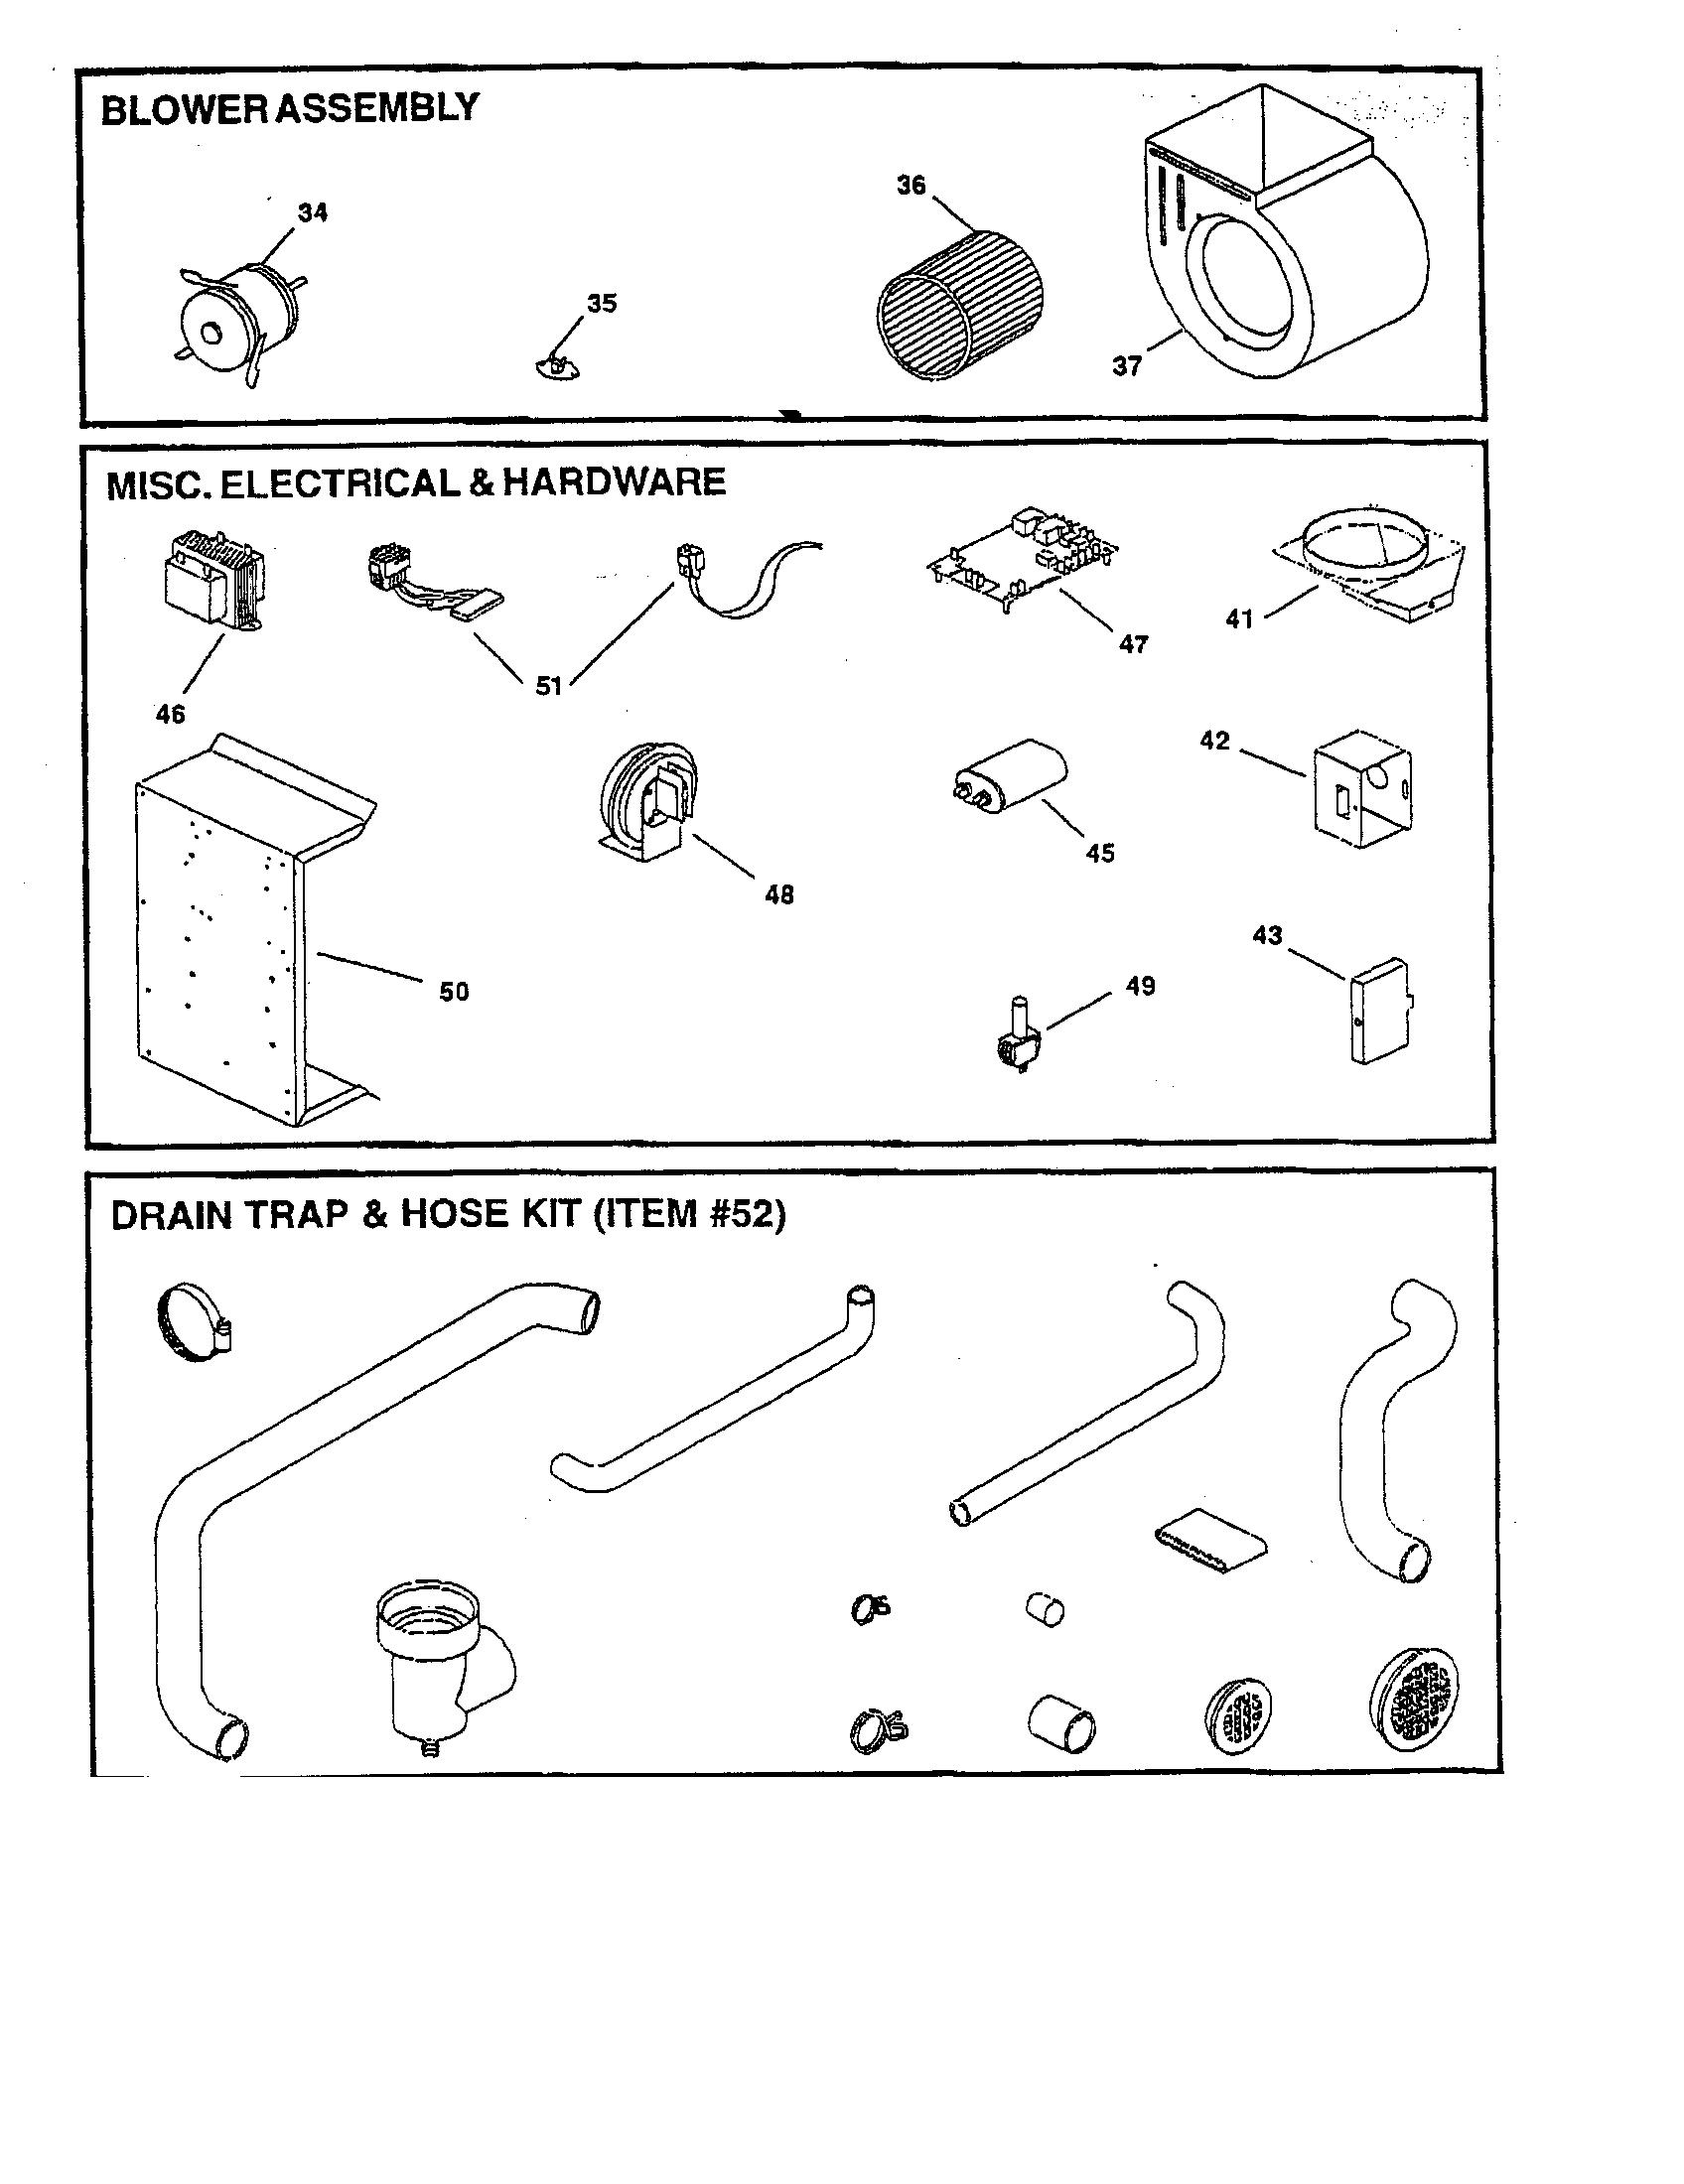 Goodman Furnace Diagram : goodman, furnace, diagram, Goodman, GMP050-3, Furnace, Parts, Sears, PartsDirect